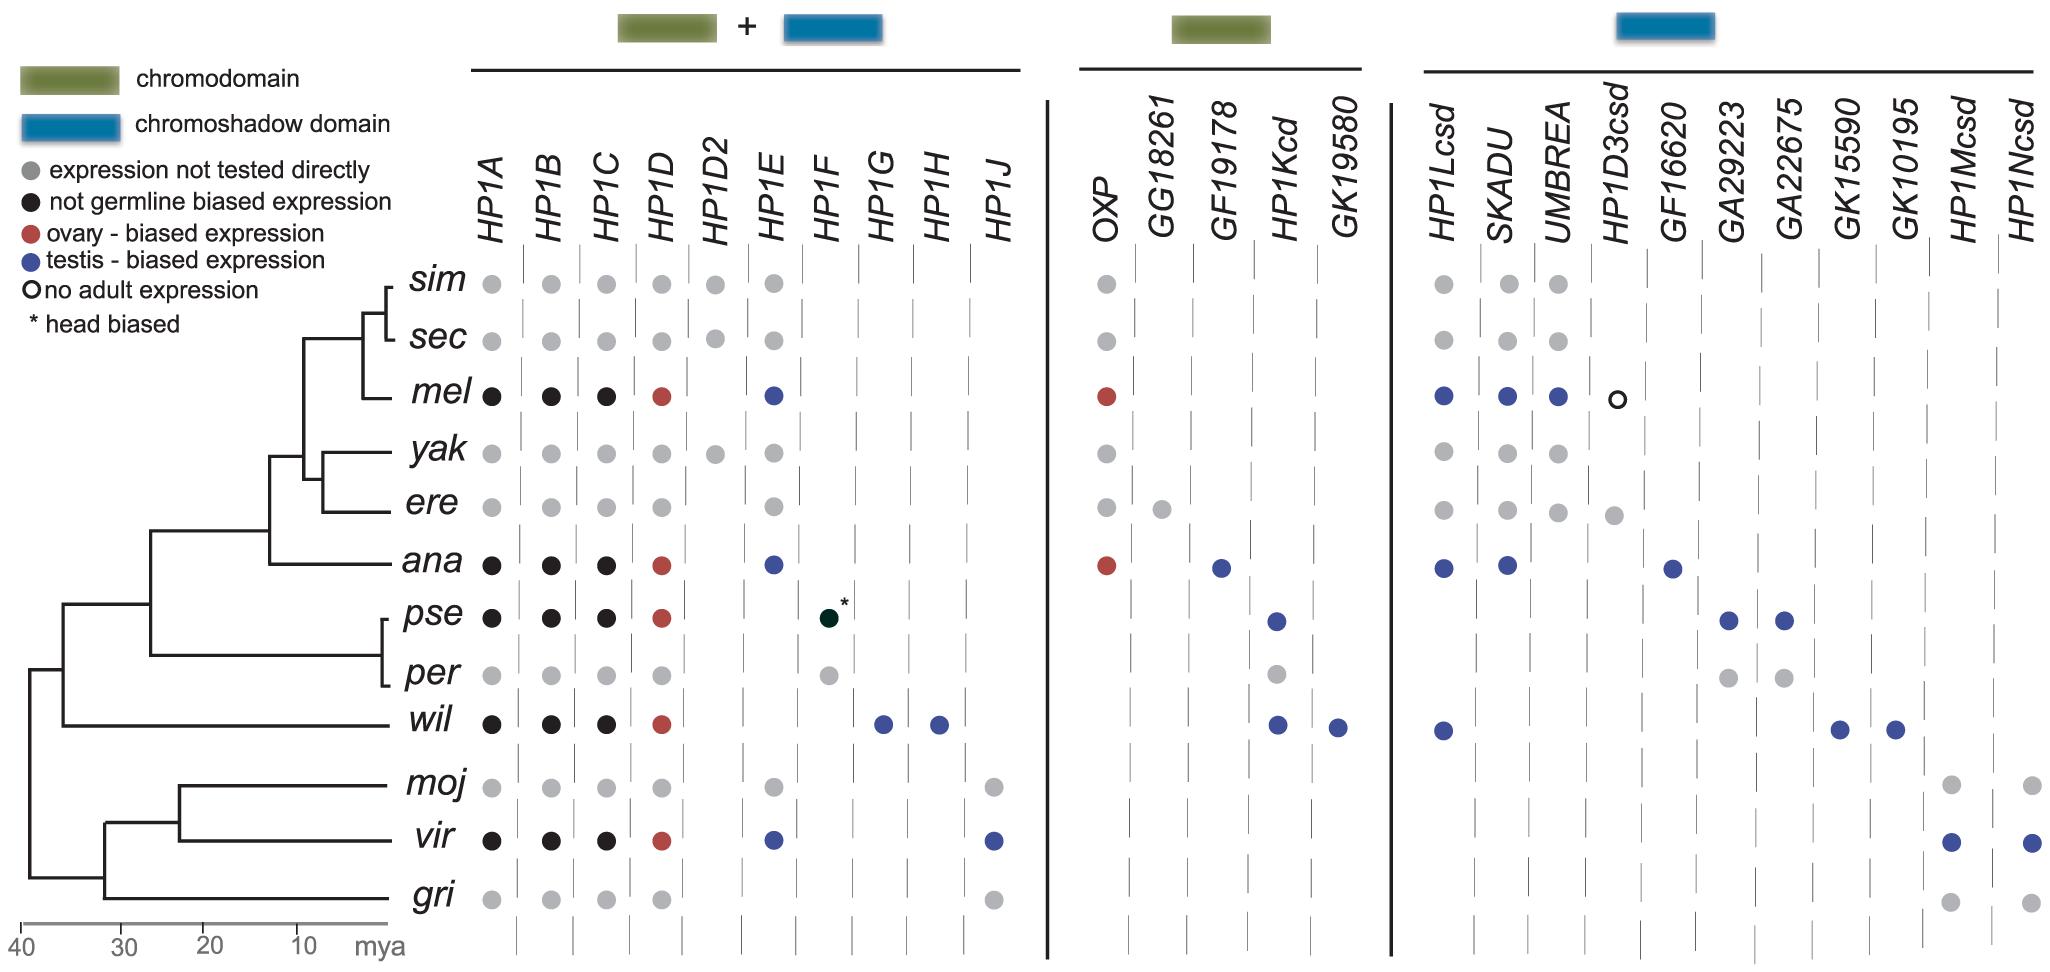 HP1 gene compendia in the 12 Drosophila species.